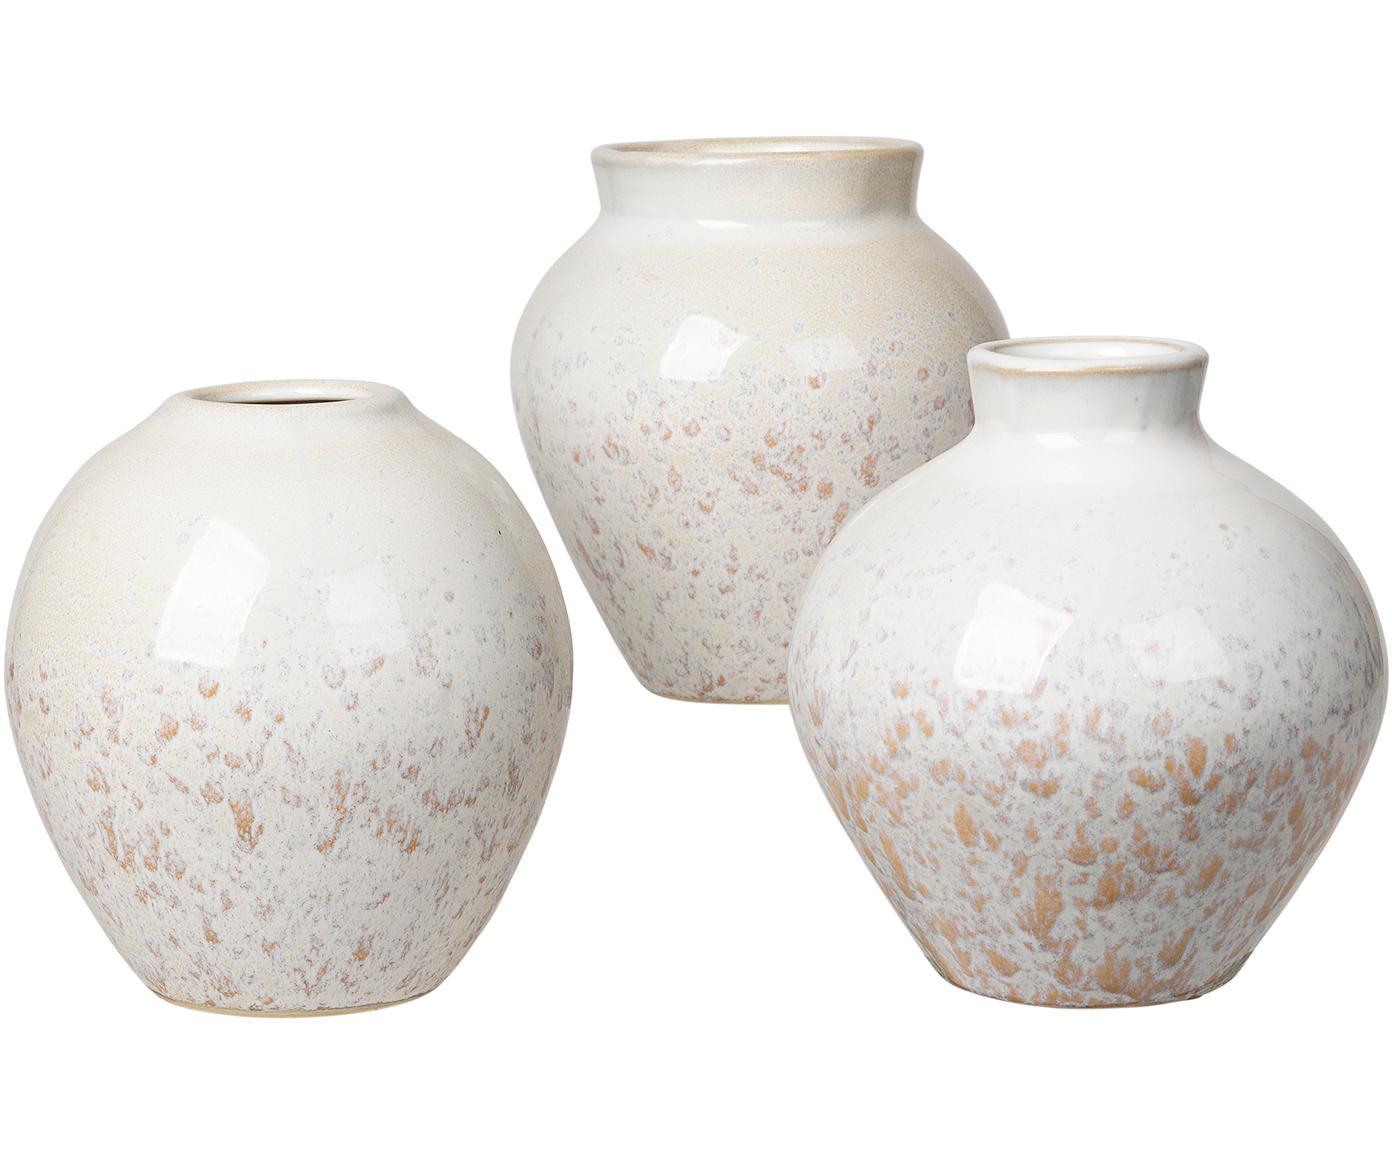 Vazenset Ingrid van keramiek, 3-delig , Keramiek, Wit, beigetinten, Ø 14 cm